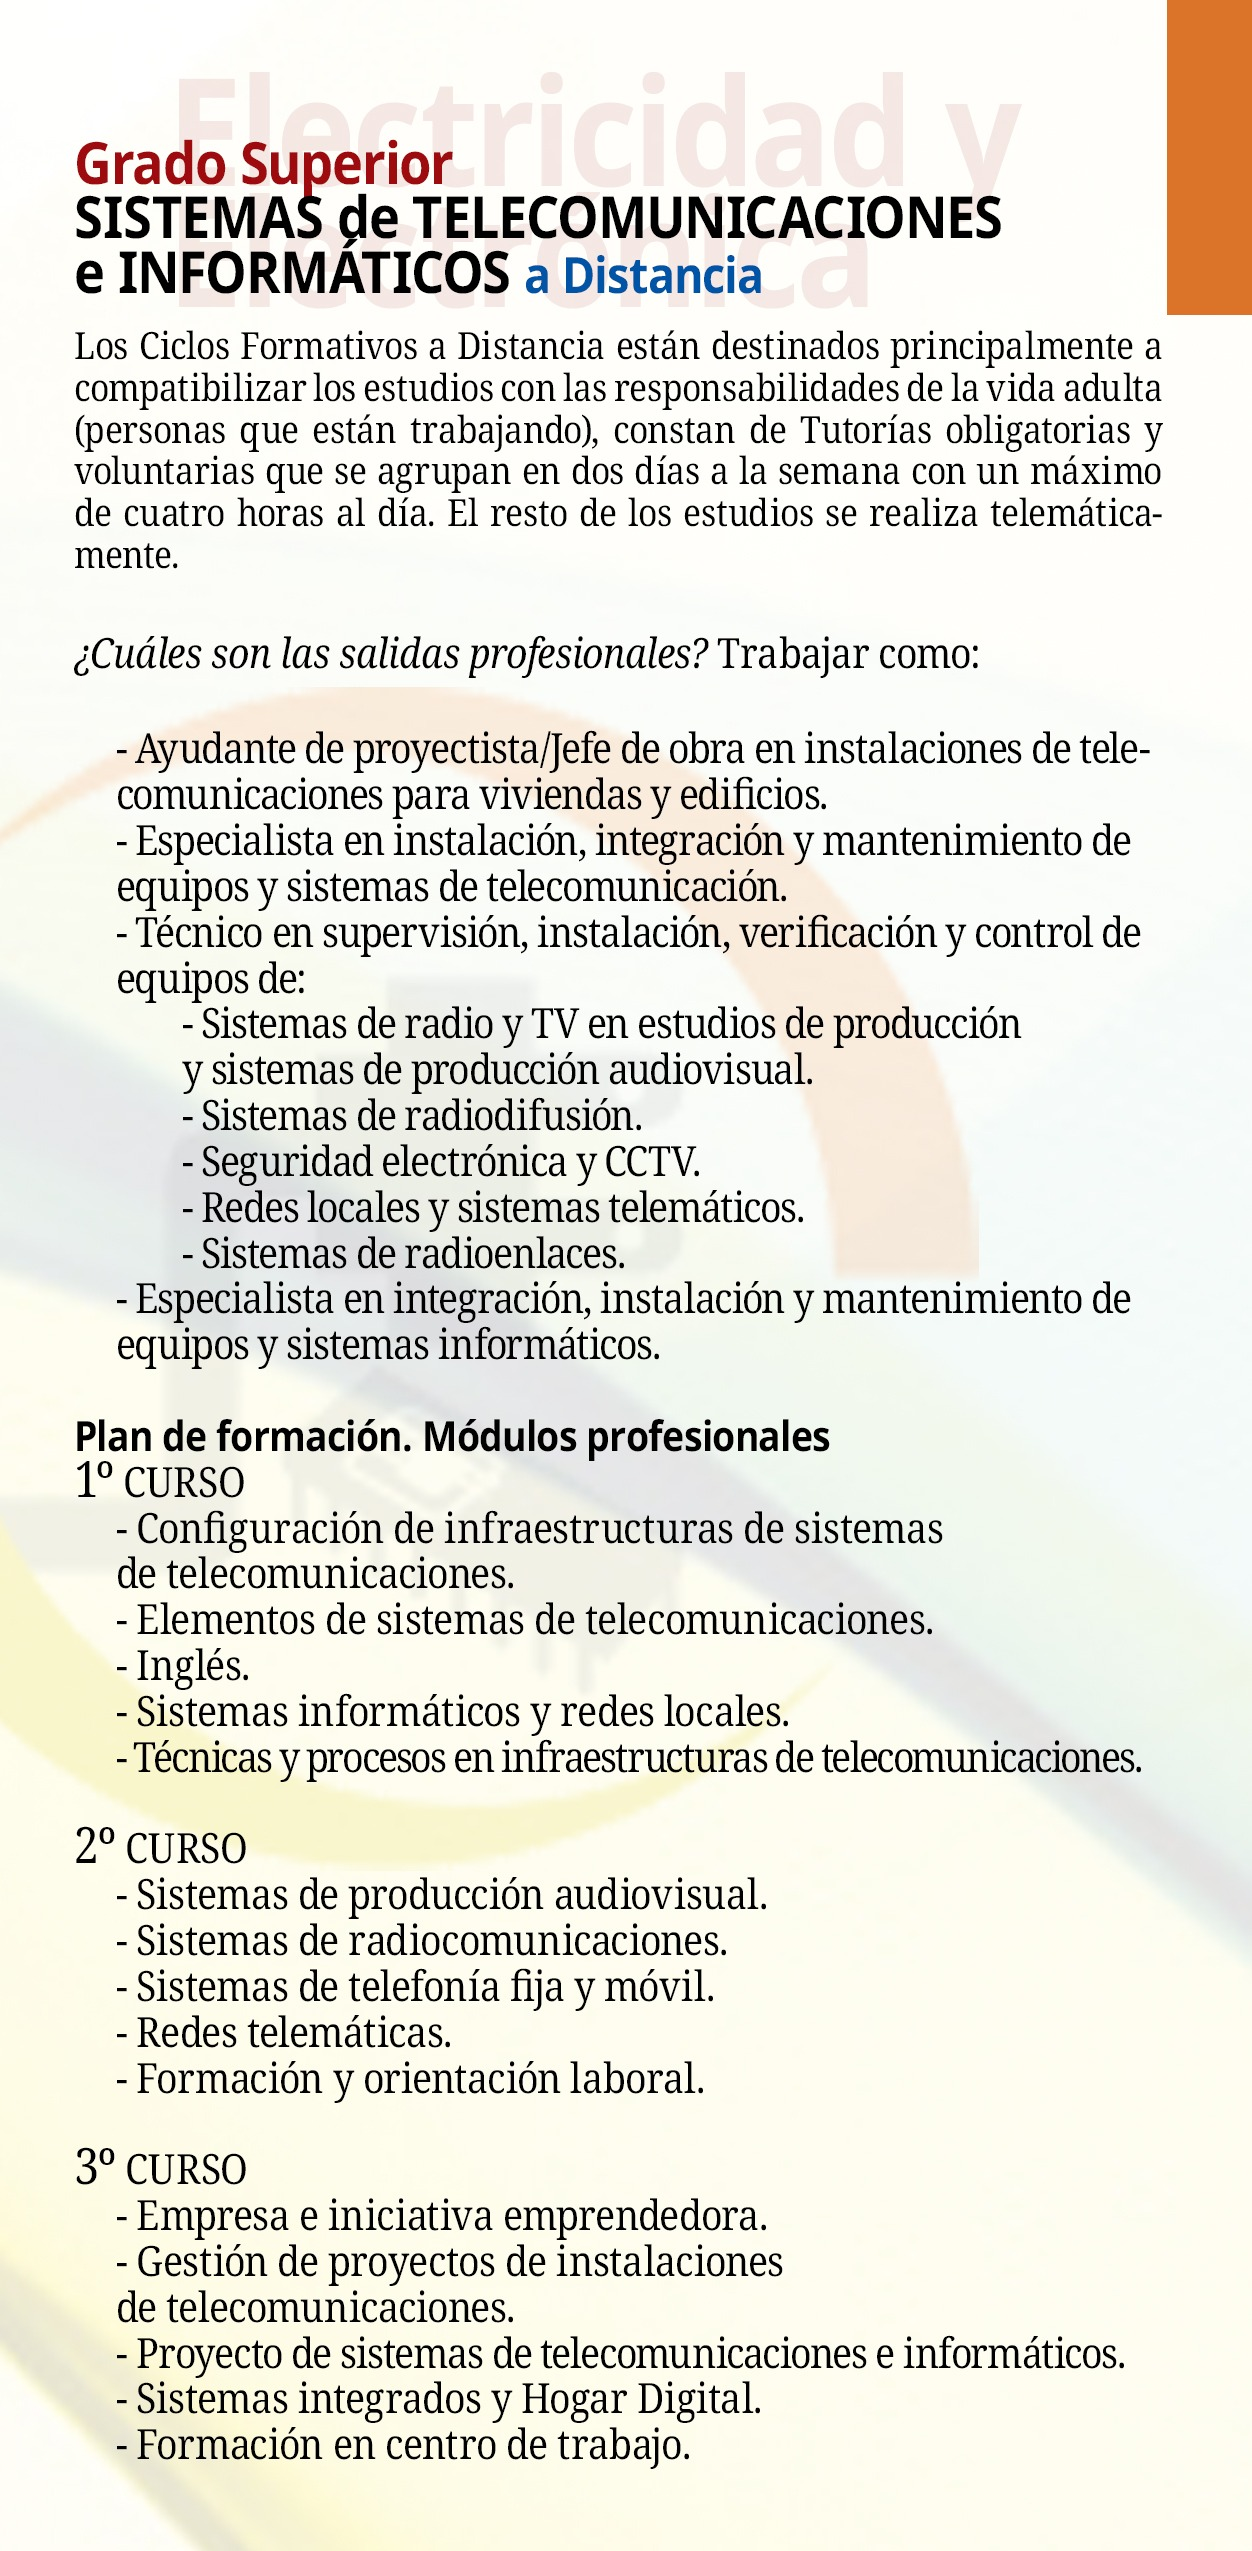 Folleto Grado Superior Sistemas Telecomunicaciones e Informáticos Semipresencial Reverso